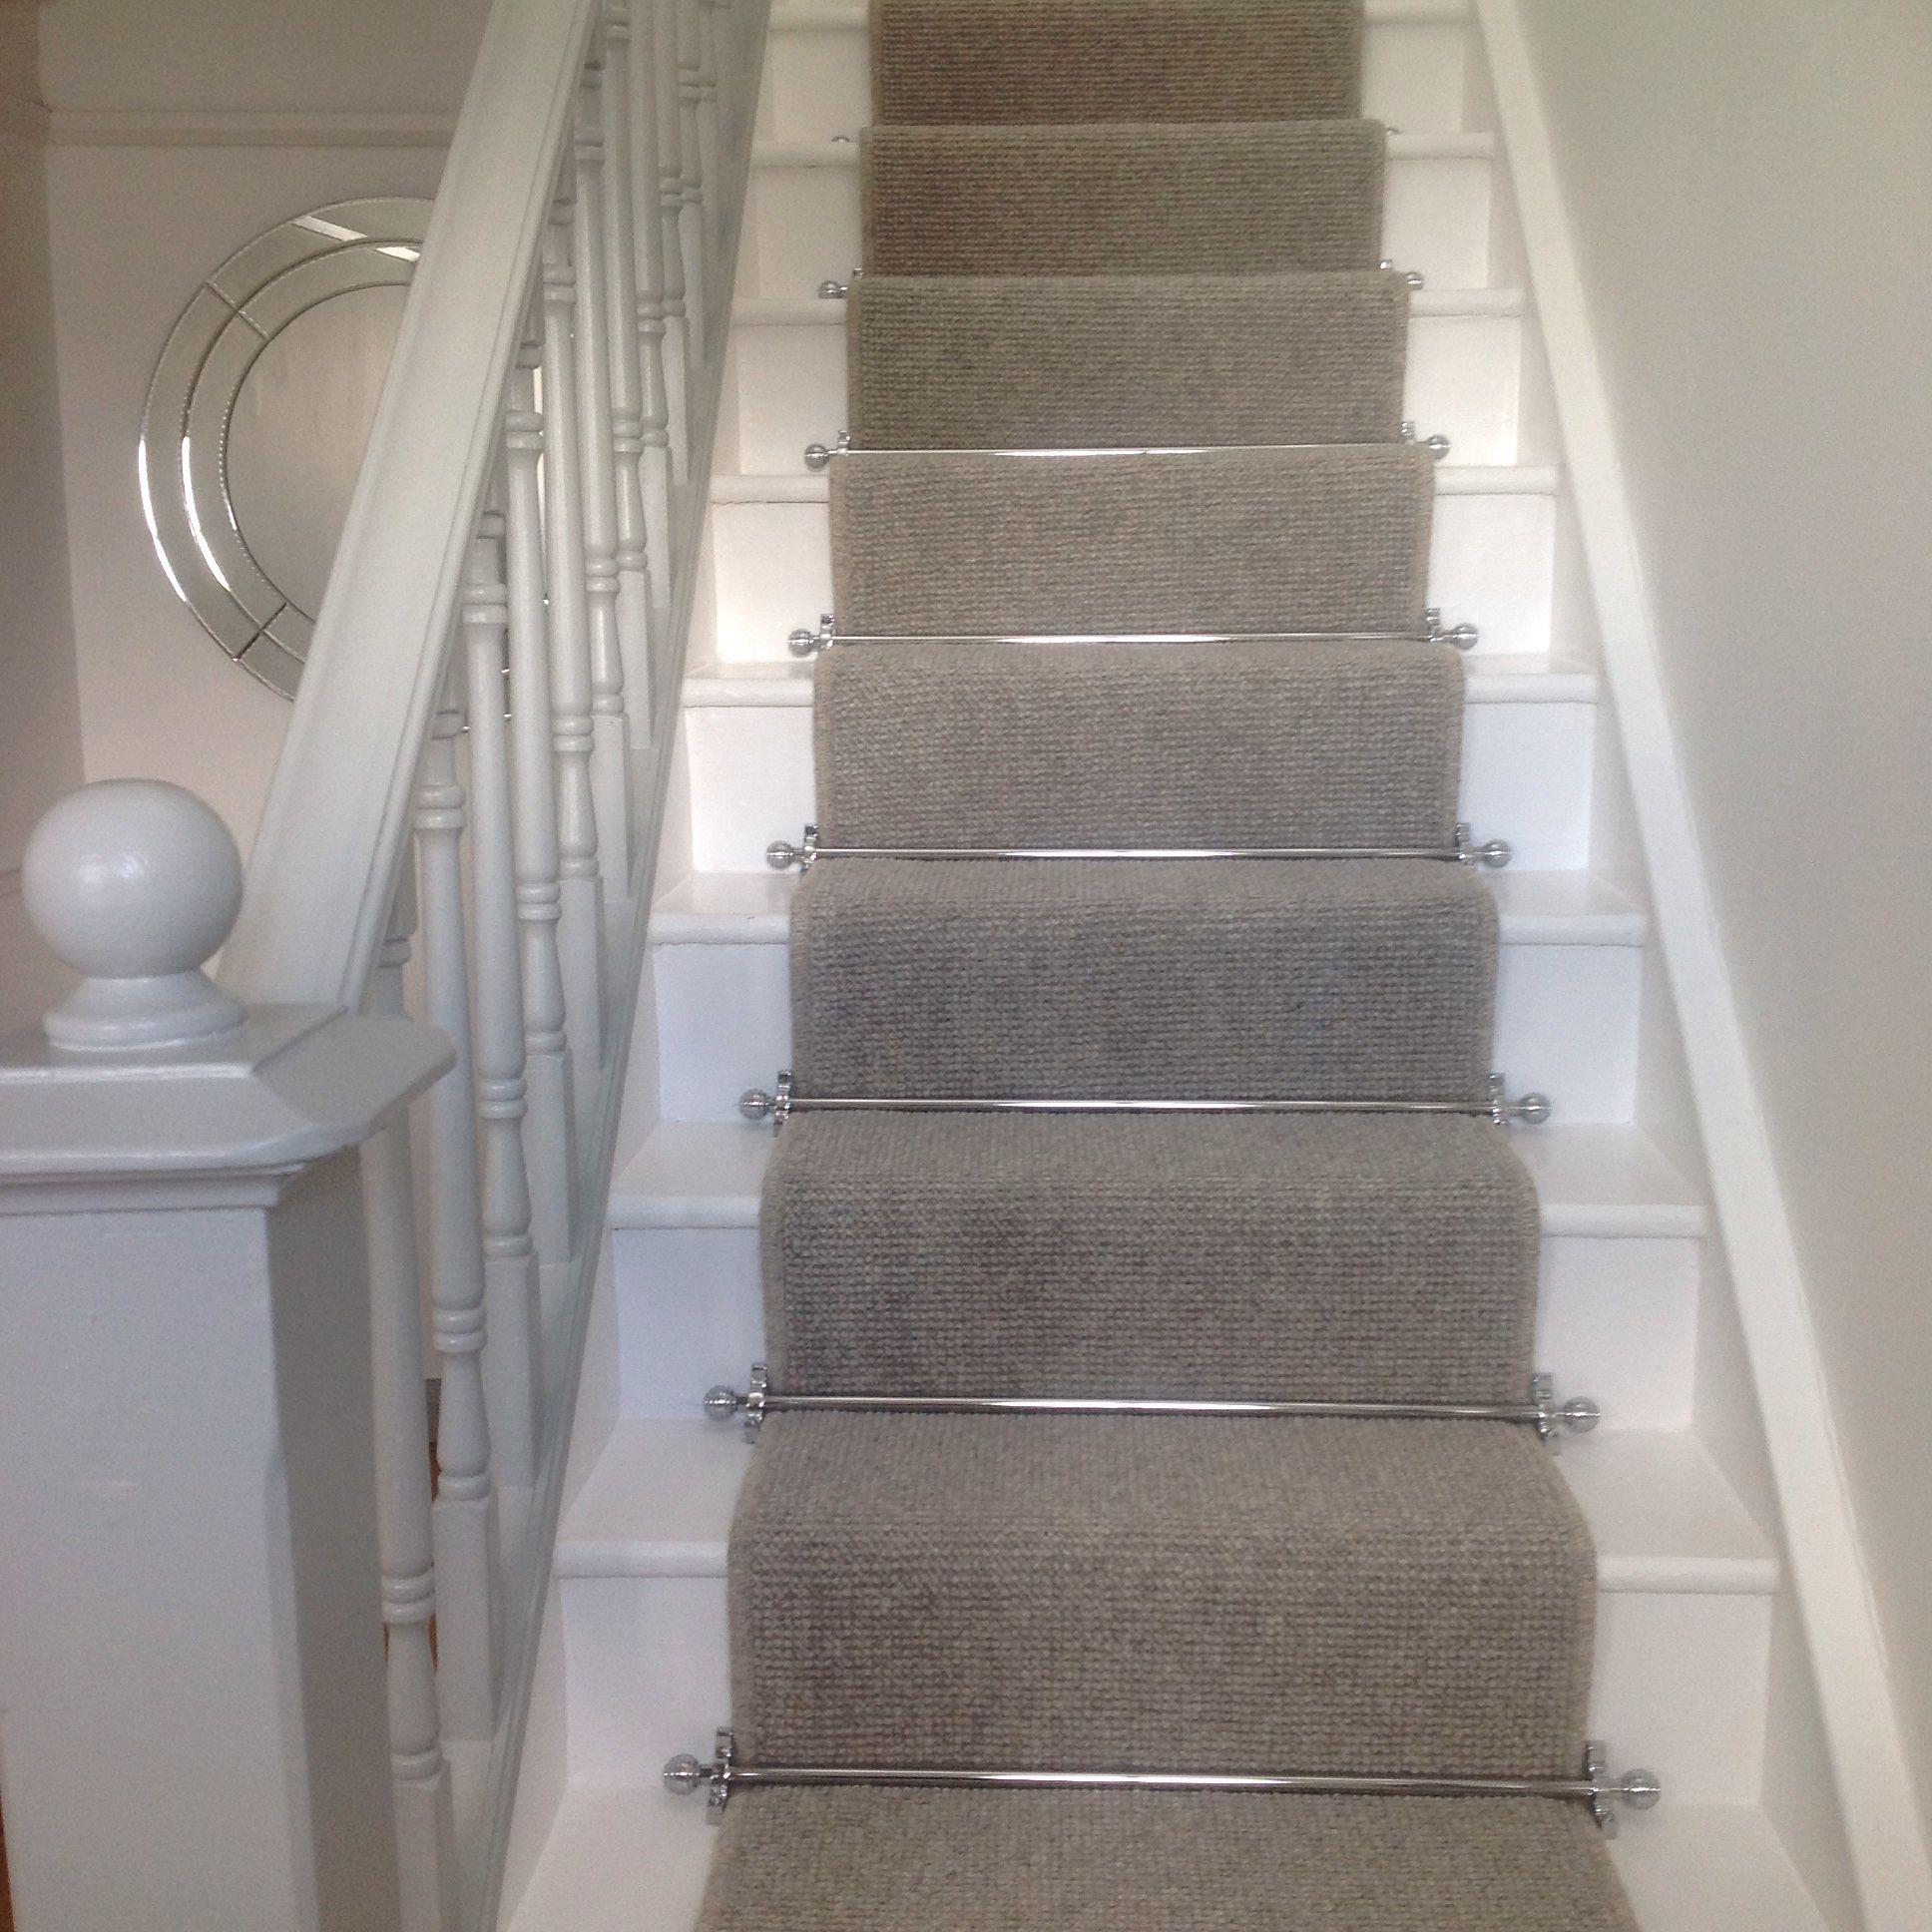 Stair Carpet Runner Stairs Stairs Painted Ideas Tags Carpet | Gray Carpet Stair Treads | Black | Set | Wood | Grey Patterned | Fitting Loop Pile Carpet